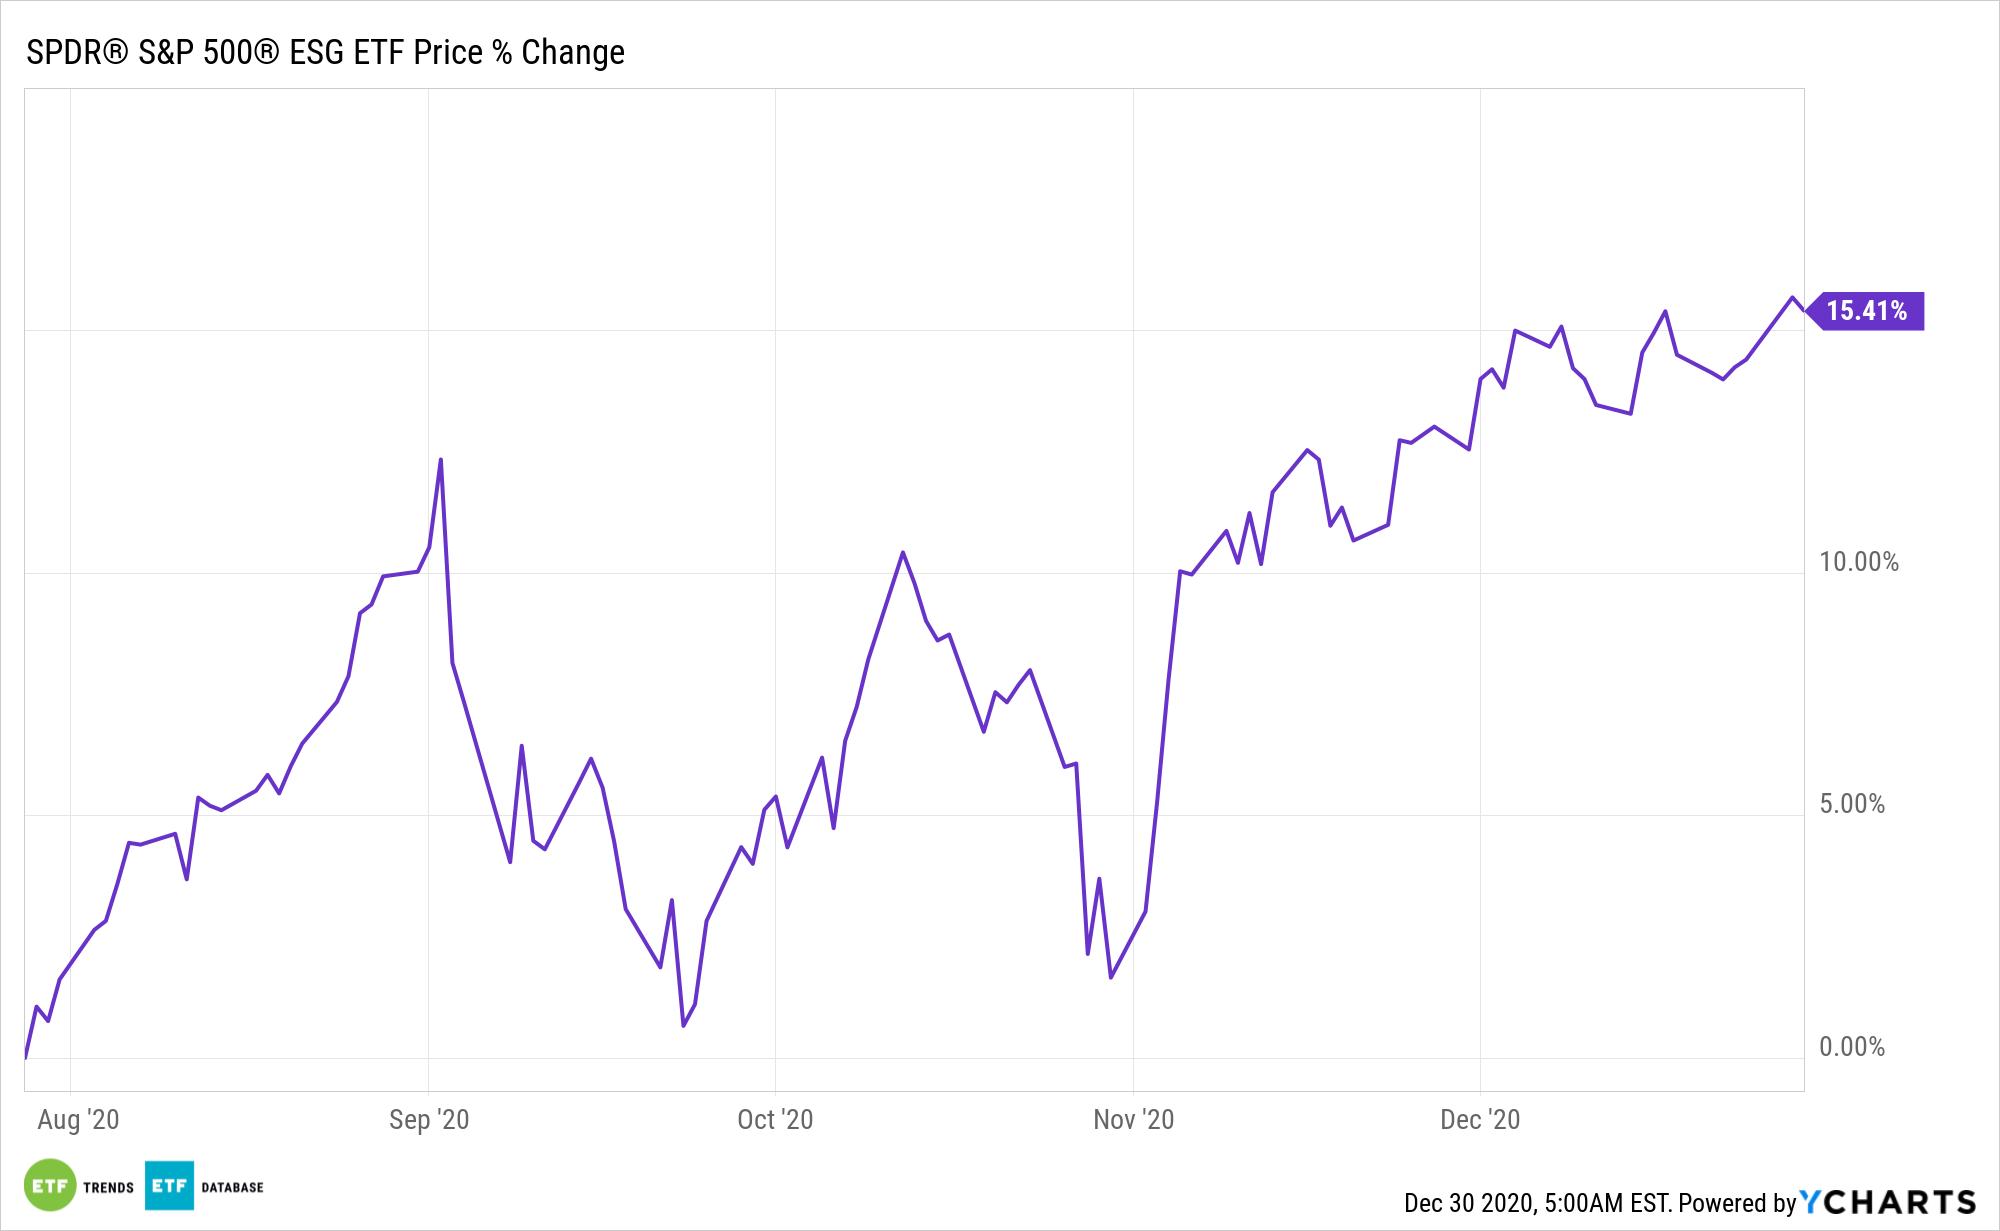 EFIV Chart